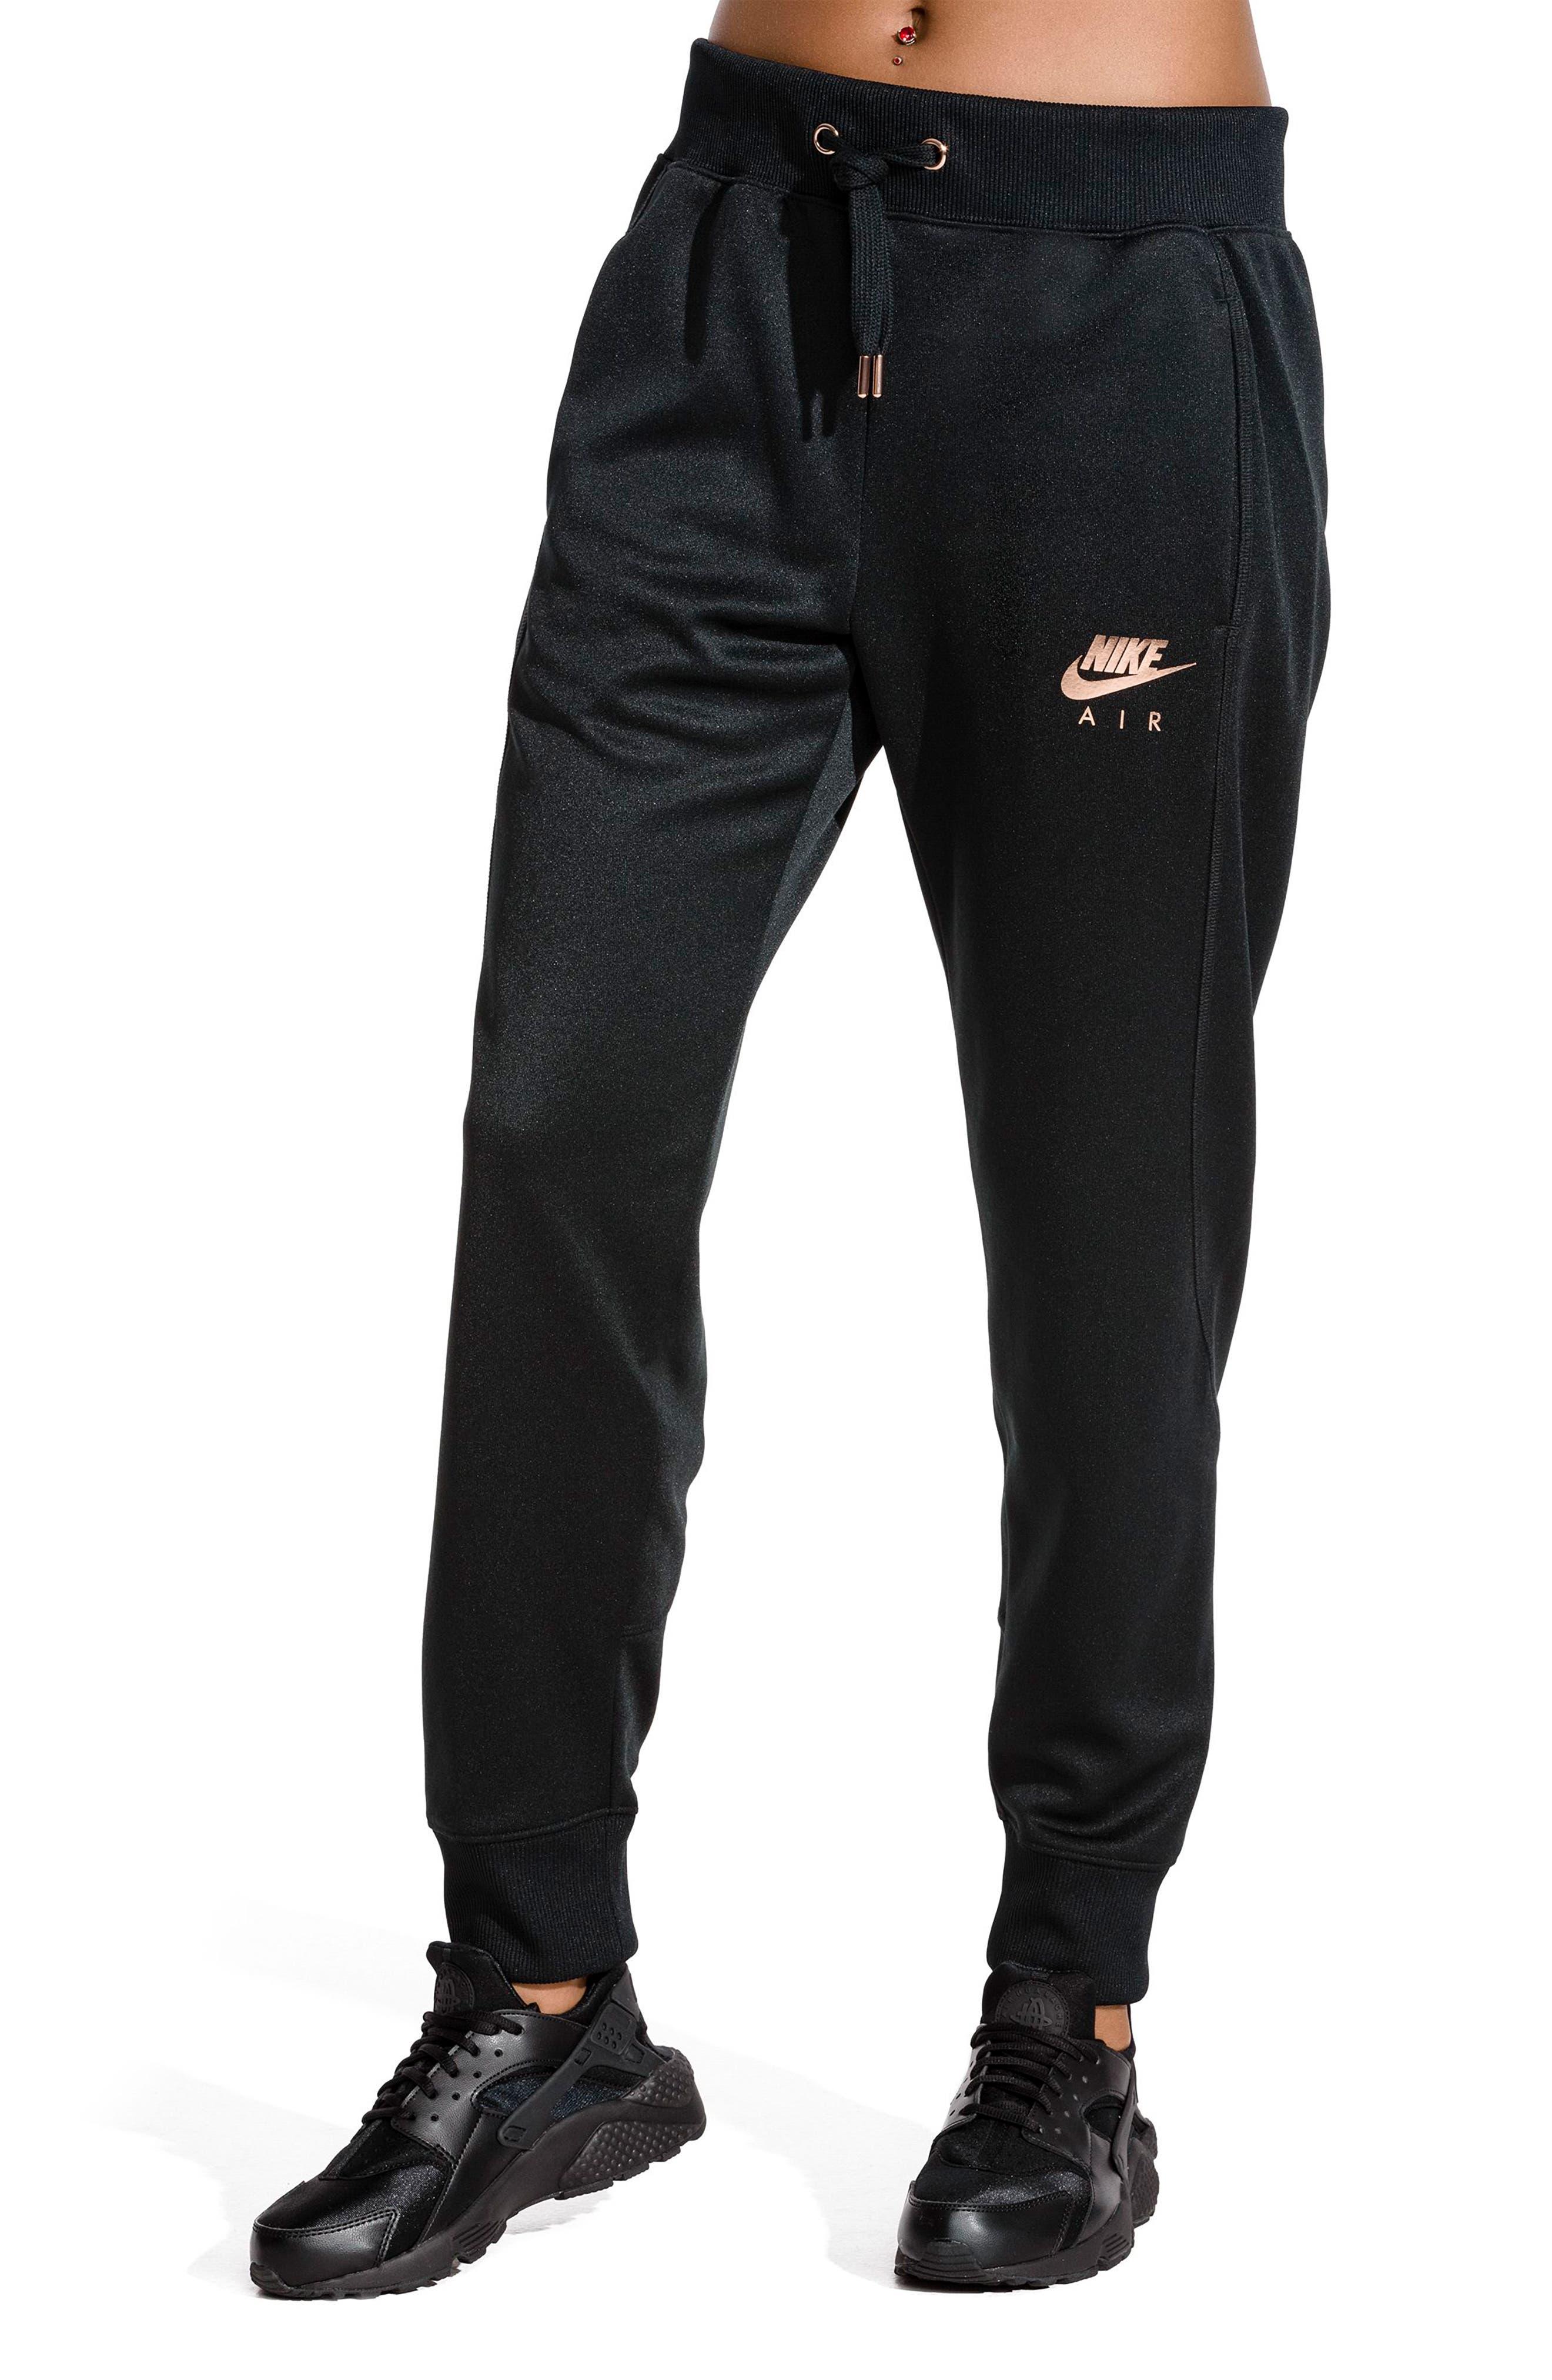 Sportswear Air Jogger Pants,                             Alternate thumbnail 10, color,                             010